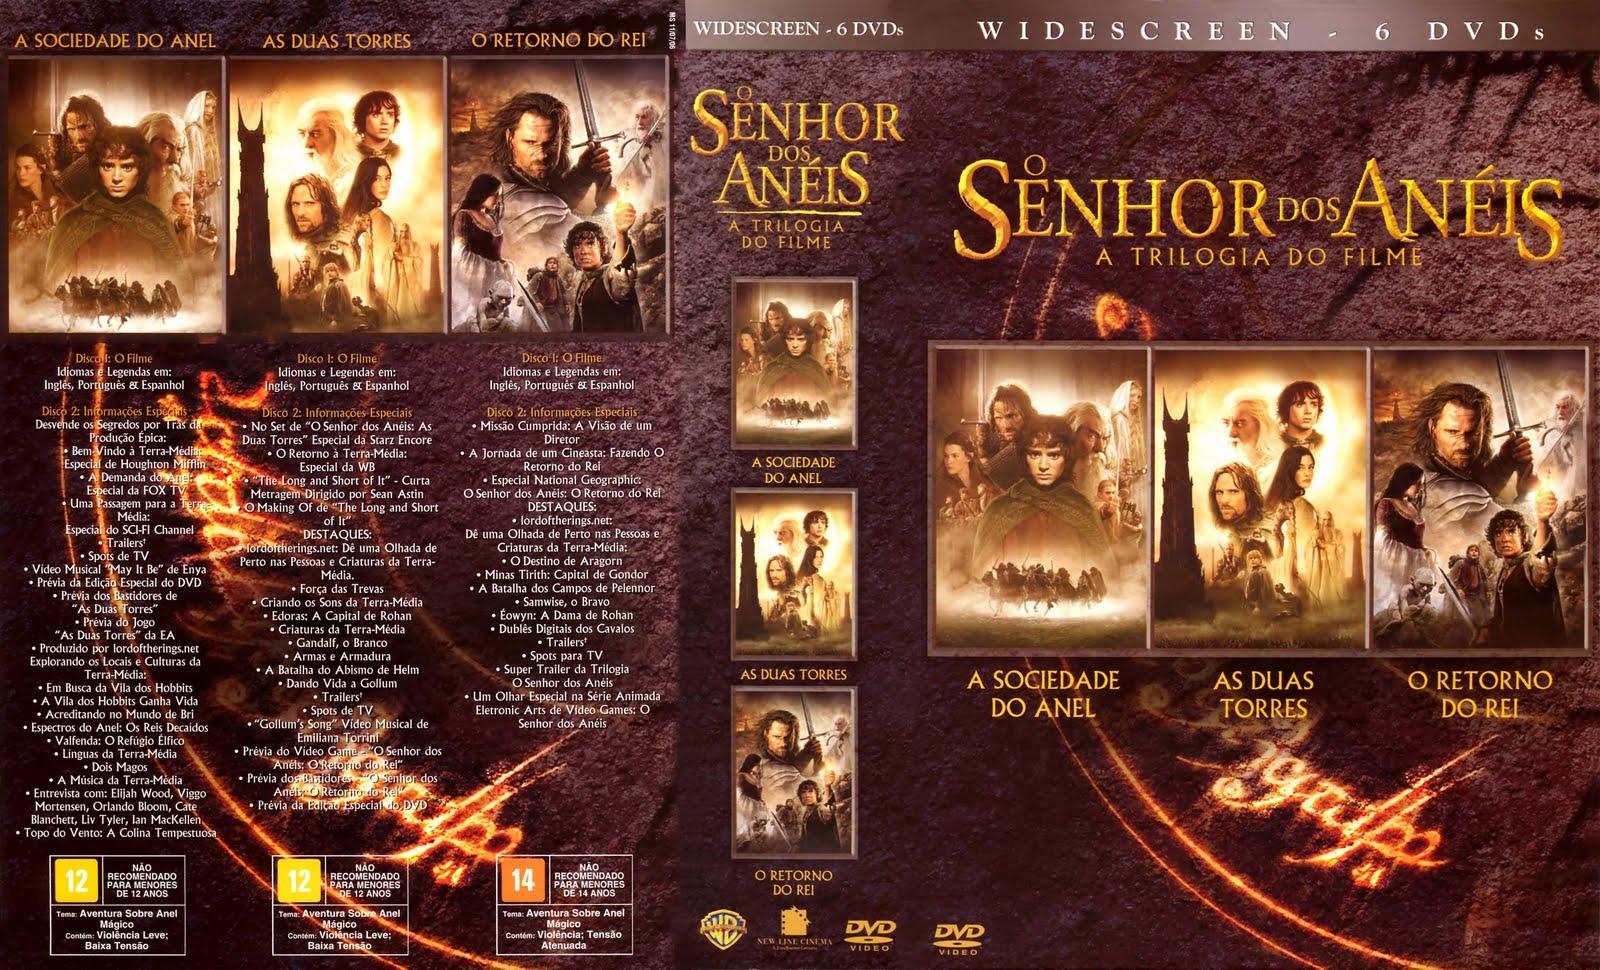 Trilogia O Senhor dos Anéis DVDRip XviD Dual Áudio Trilogia 2BO 2BSenhor 2Bdos 2BAn 25C3 25A9is 2BDVD 2BXANDAODOWNLOAD